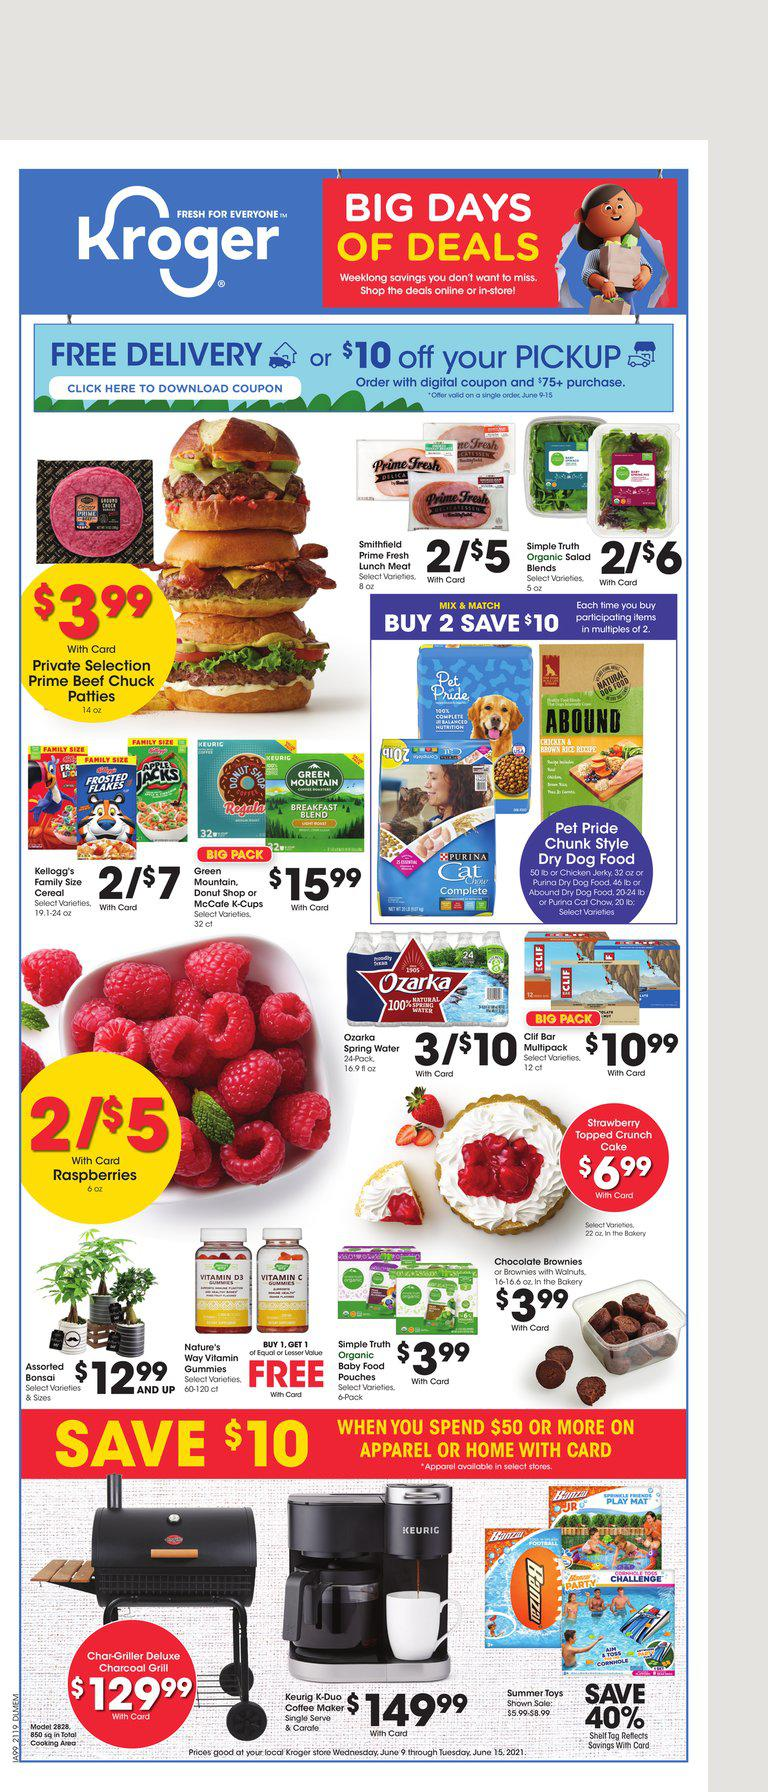 09.06.2021 Kroger ad 1. page